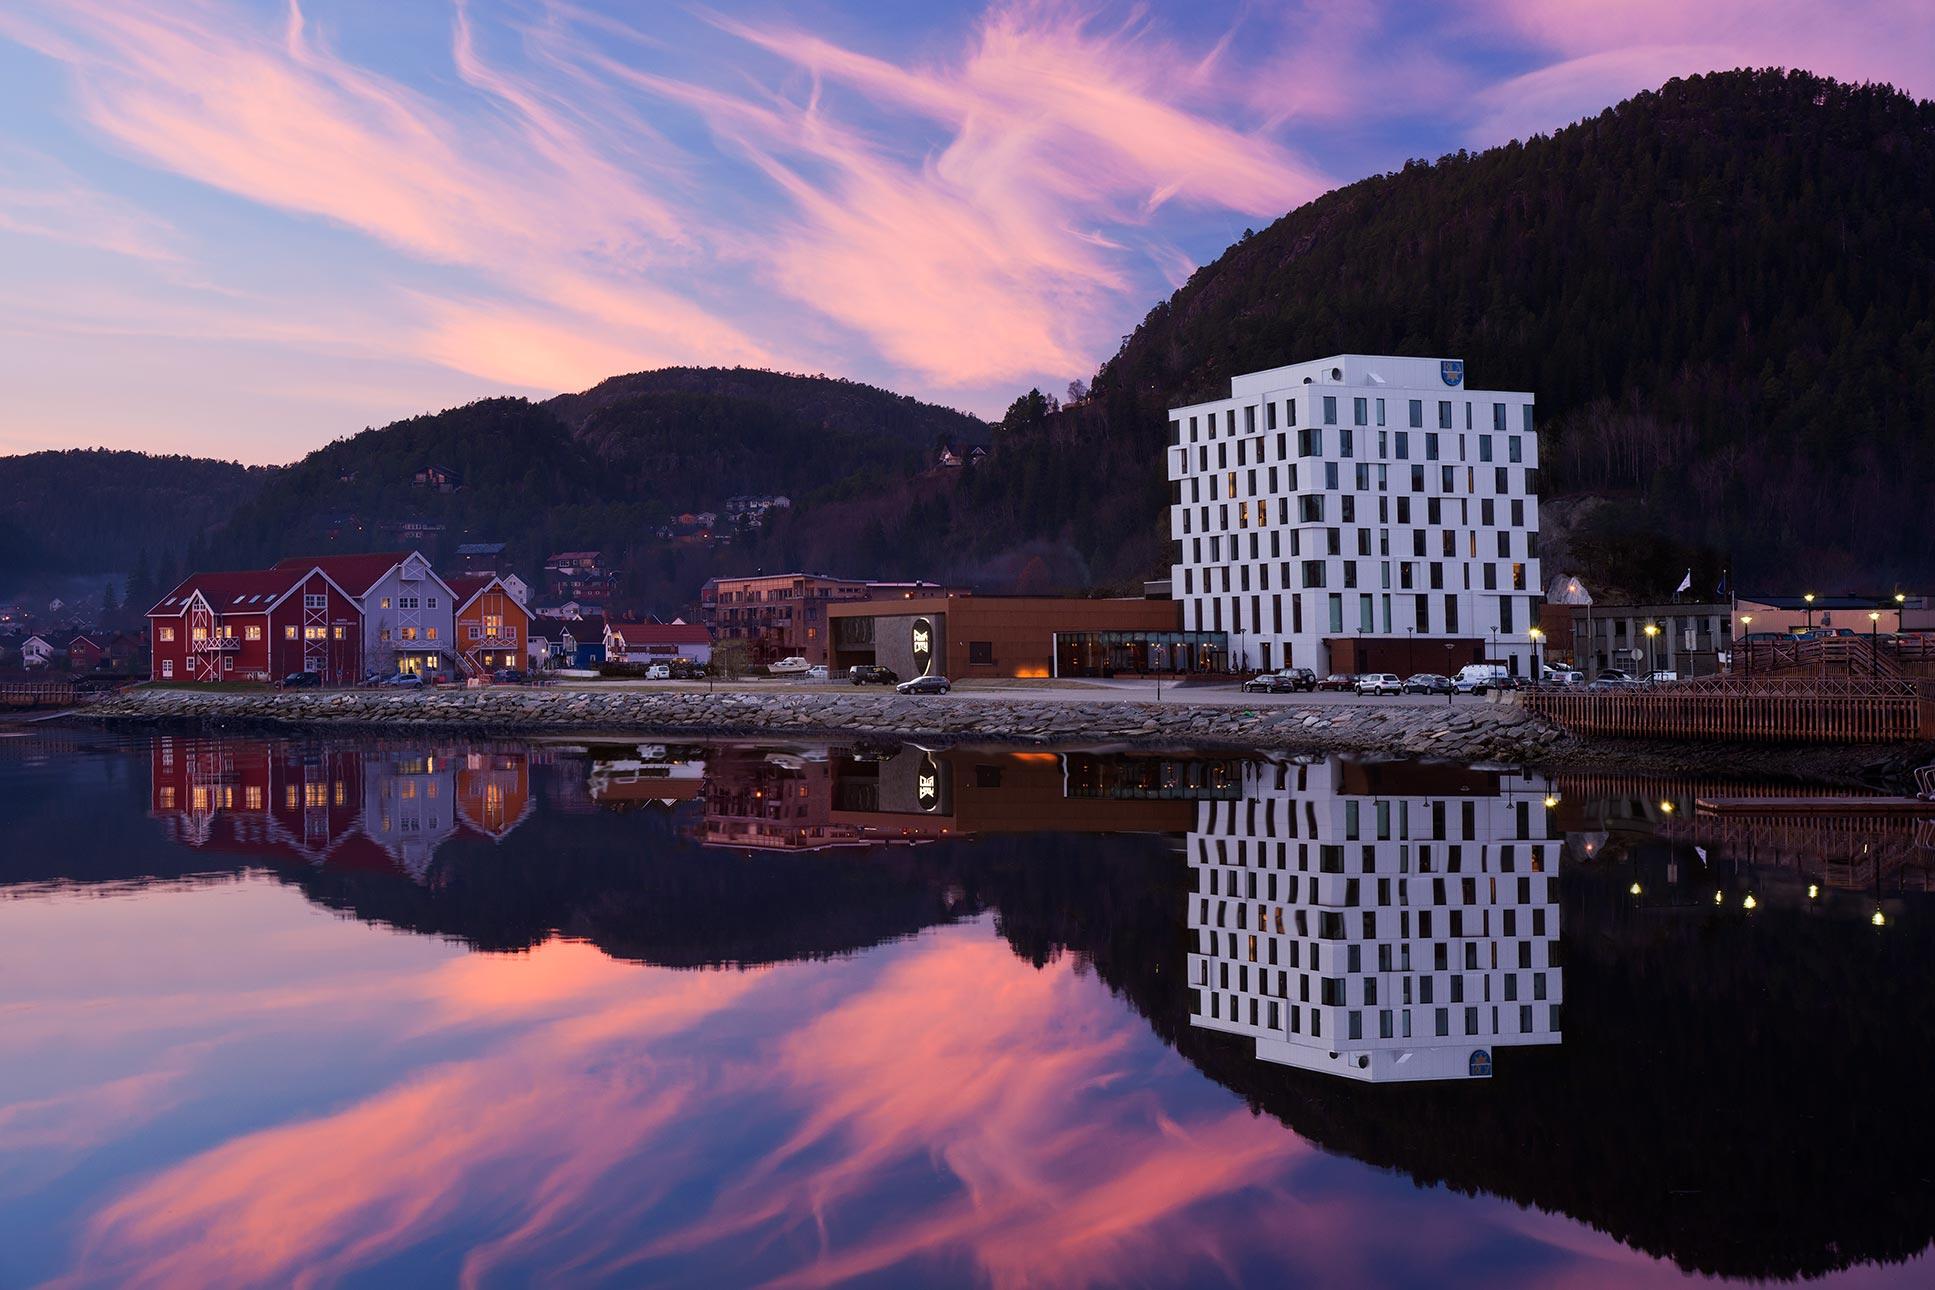 sommerferie i norge Mosjøen